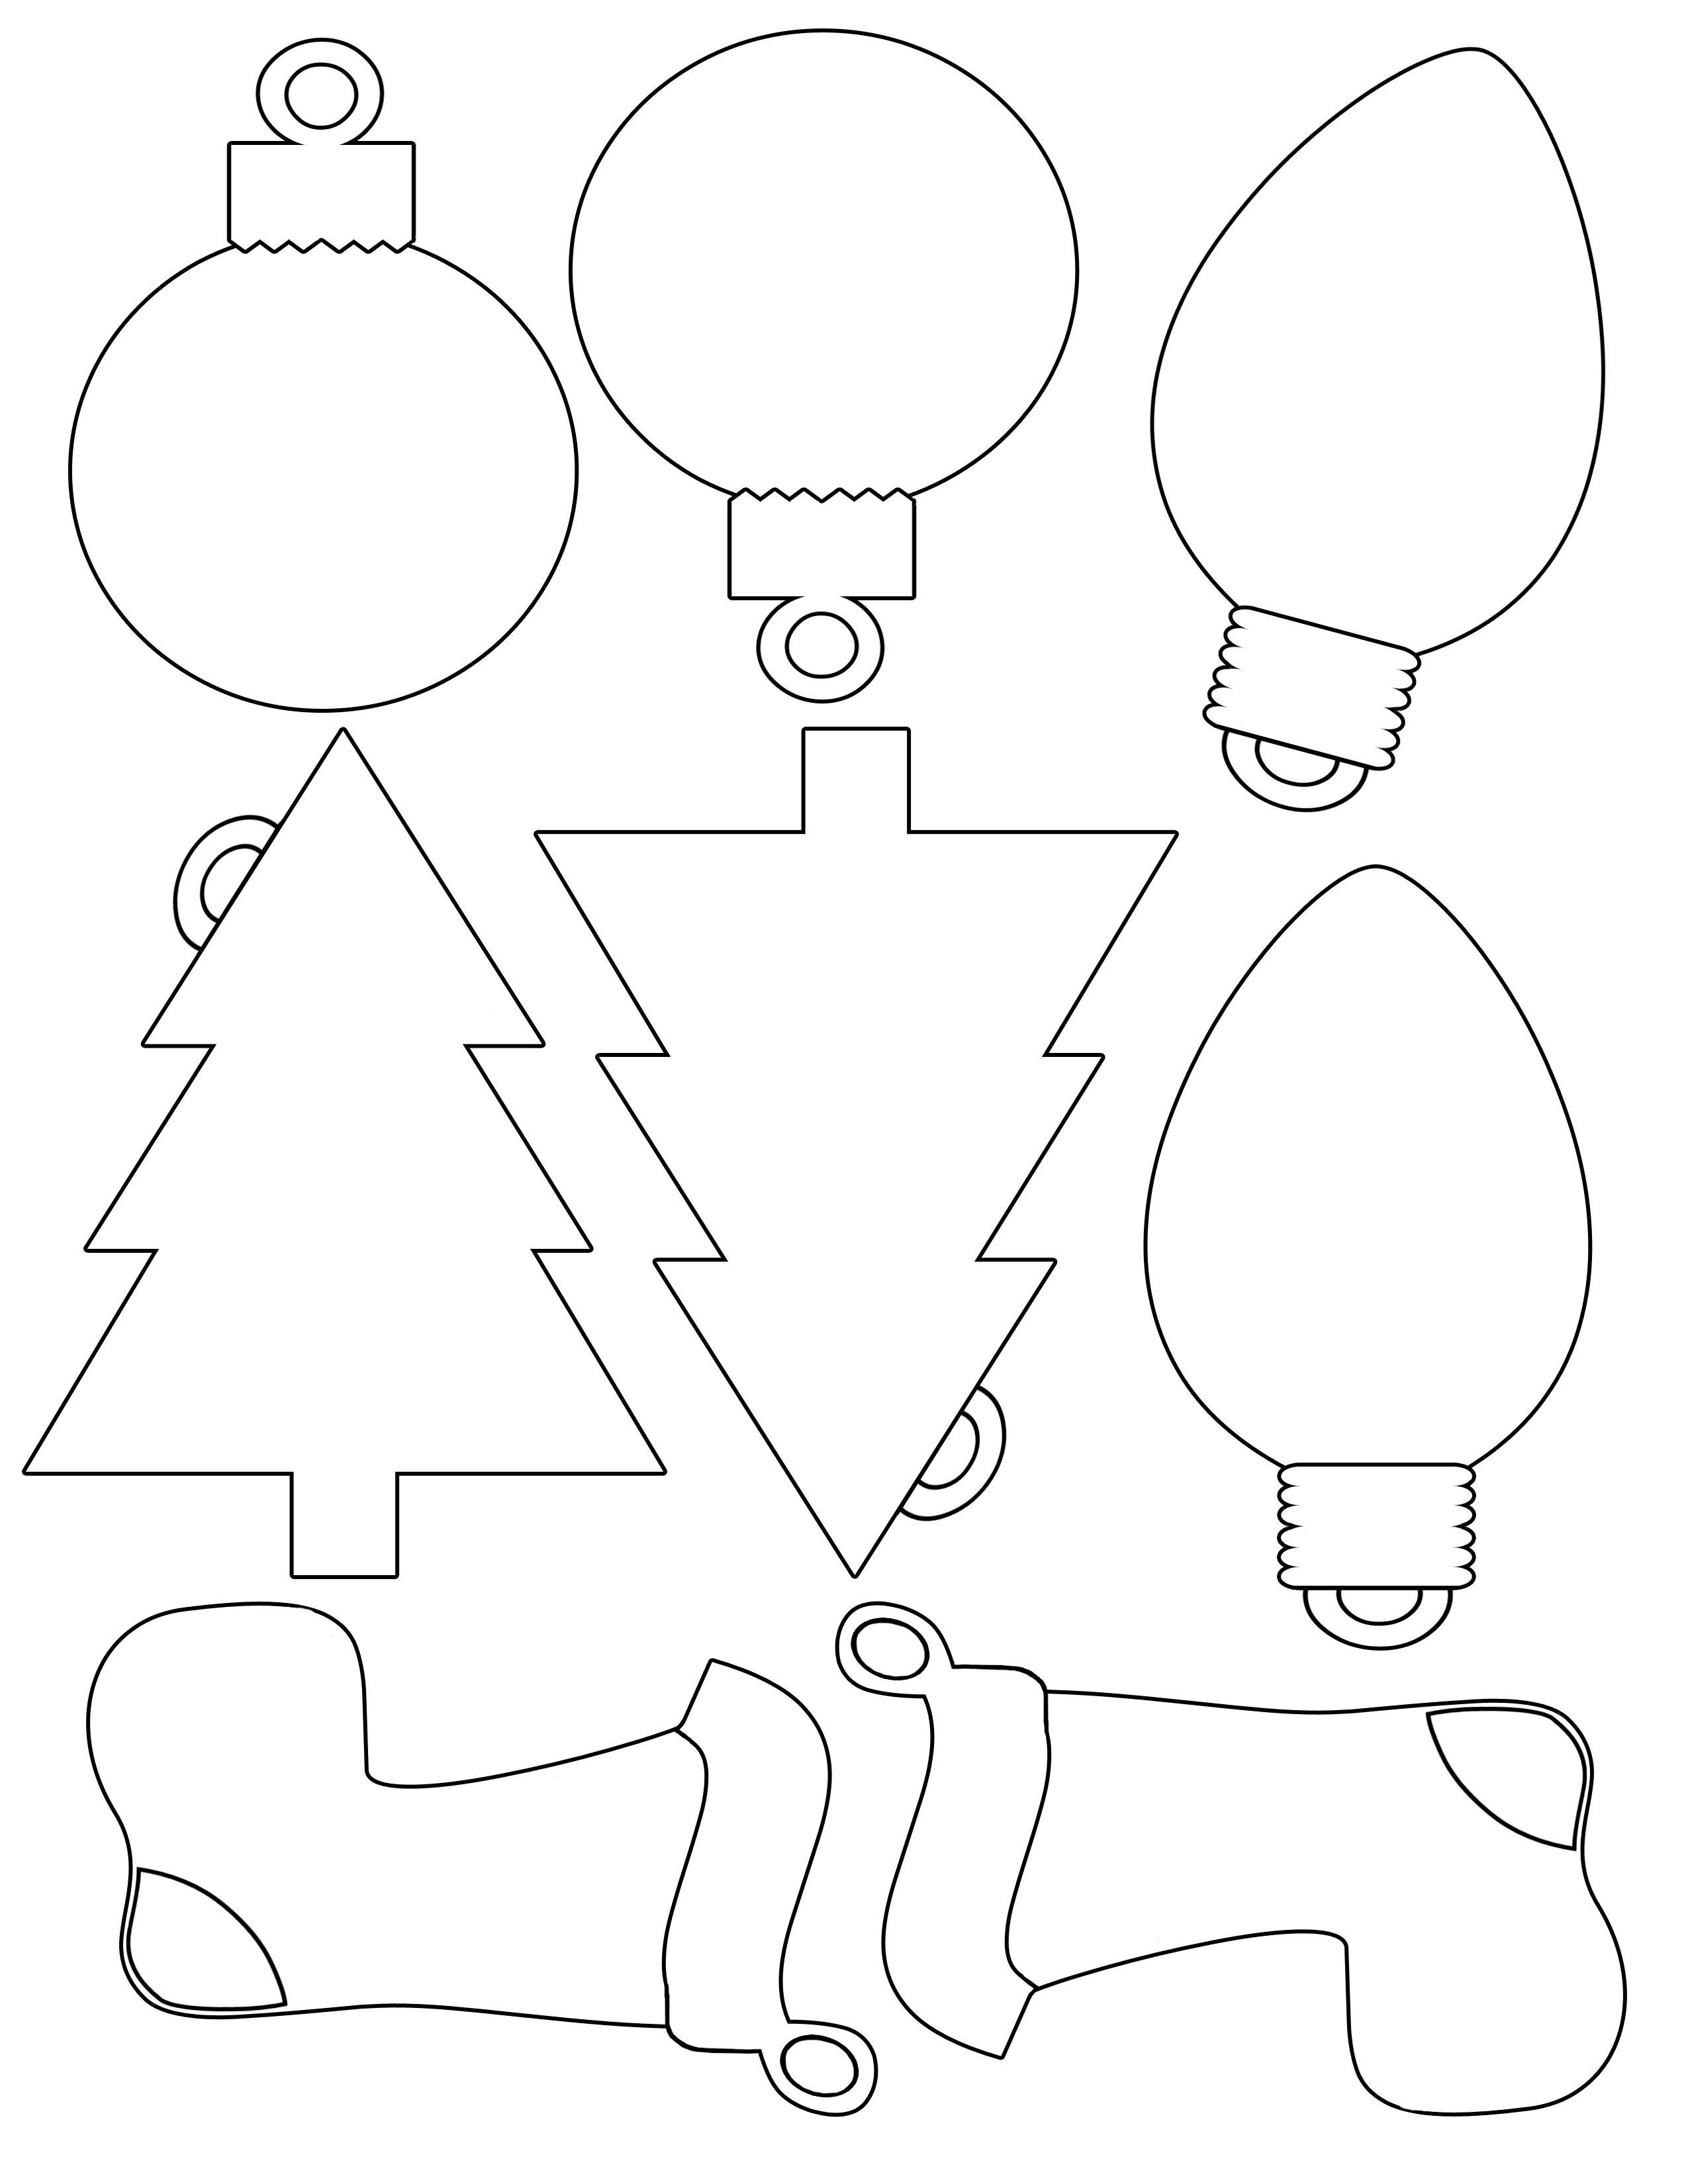 Printable Christmas Envelope |  For Christmas Shapes For Gift - Free Printable Felt Christmas Ornament Patterns